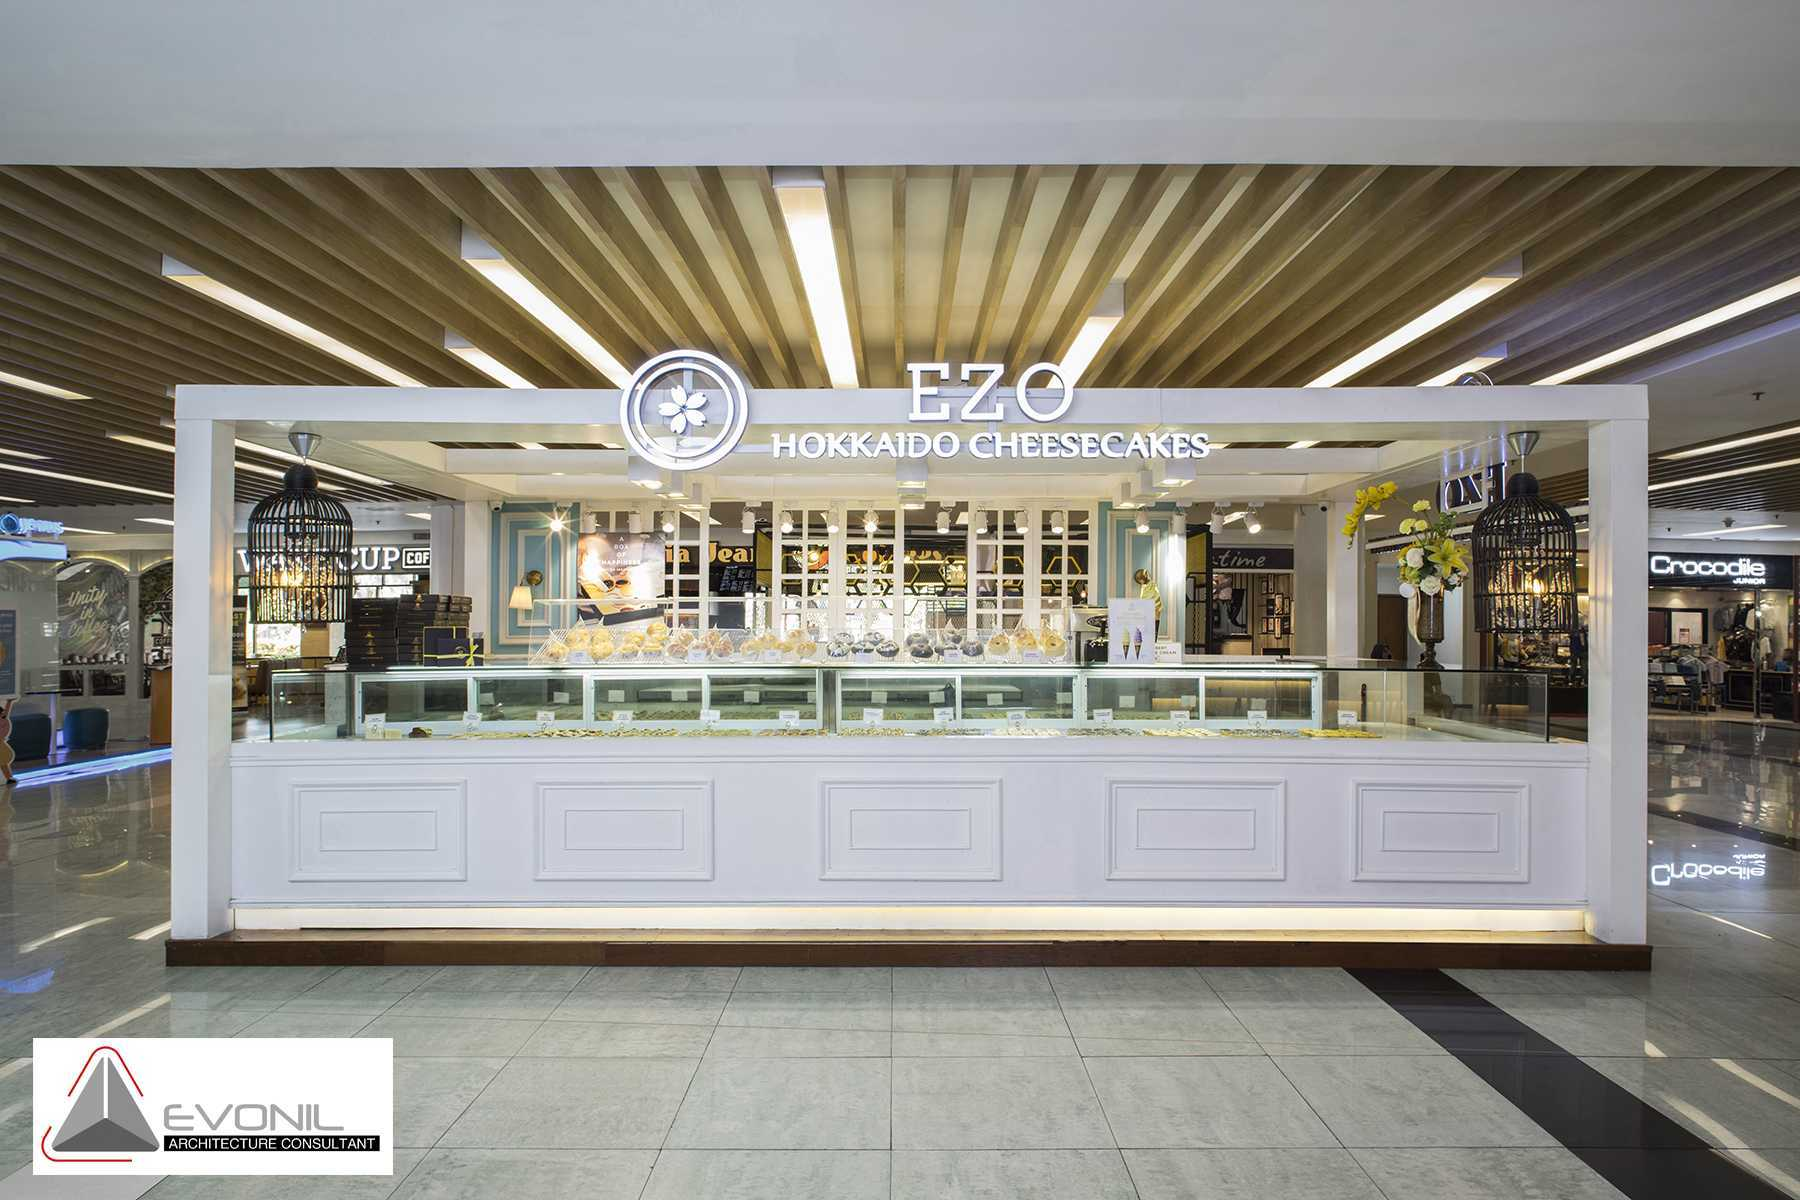 Evonil Architecture Ezo Cheesecakes Bakery - Mall Citraland Jakarta, Daerah Khusus Ibukota Jakarta, Indonesia Jakarta, Daerah Khusus Ibukota Jakarta, Indonesia Evonil-Architecture-Ezo-Cheesecakes-Bakery-Mall-Citraland  59575